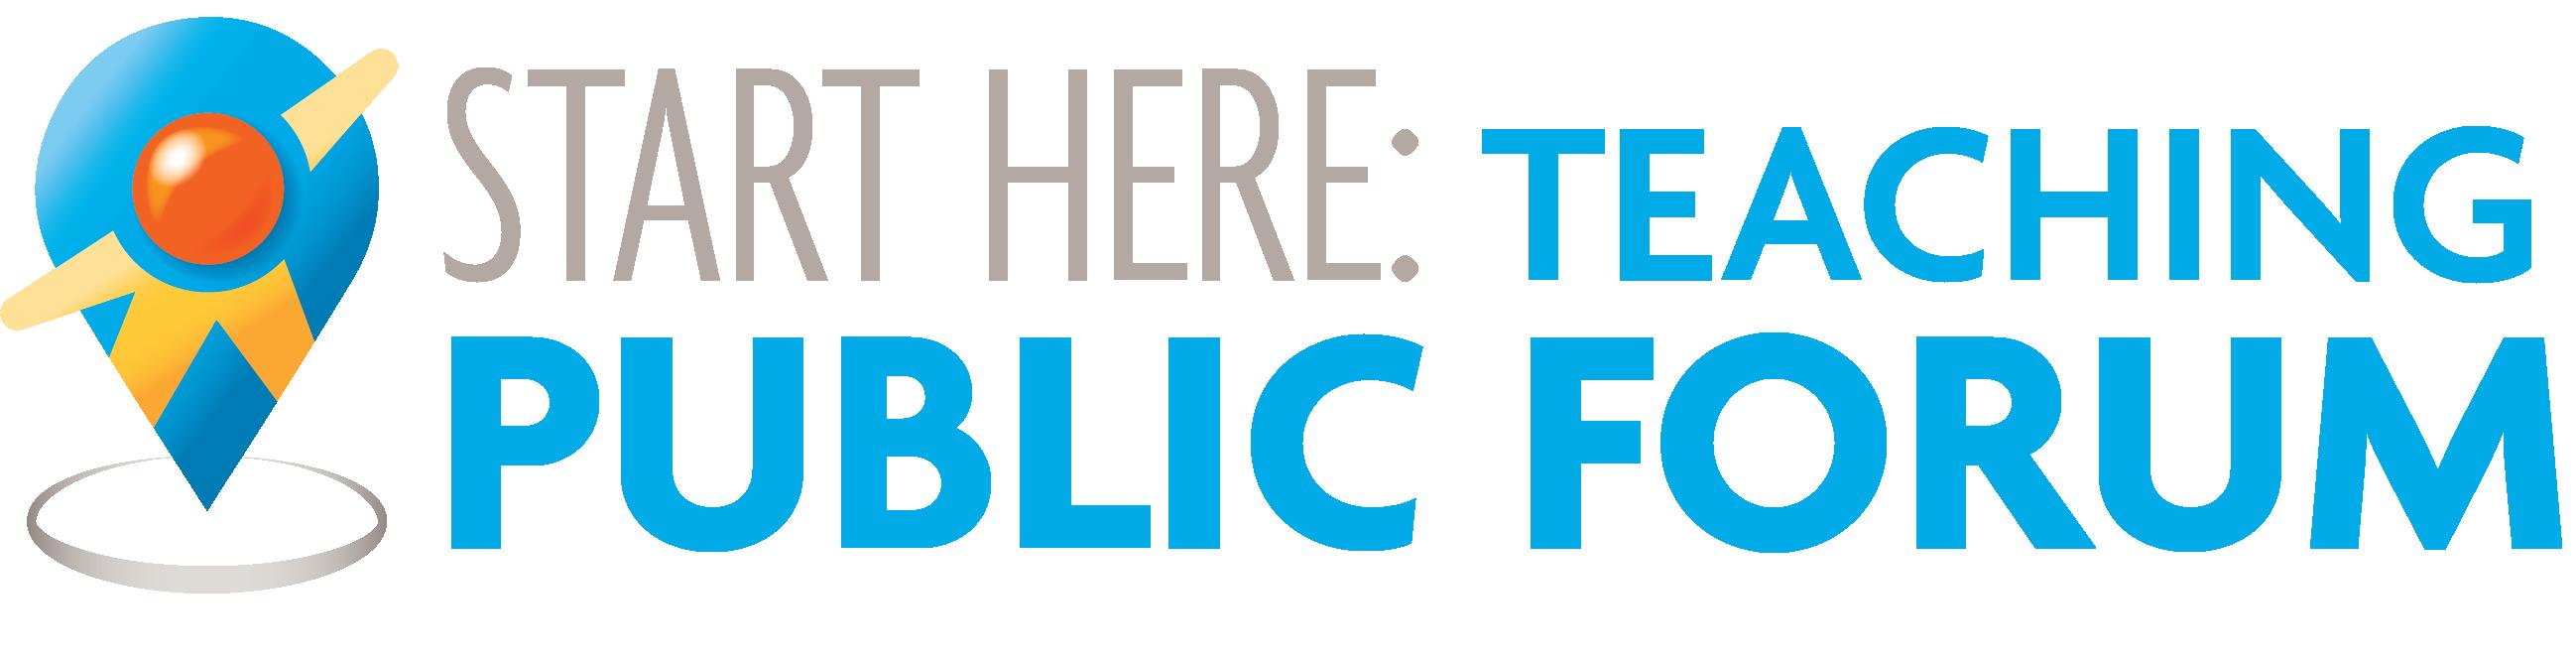 Start Here: Teaching Public Forum Logo